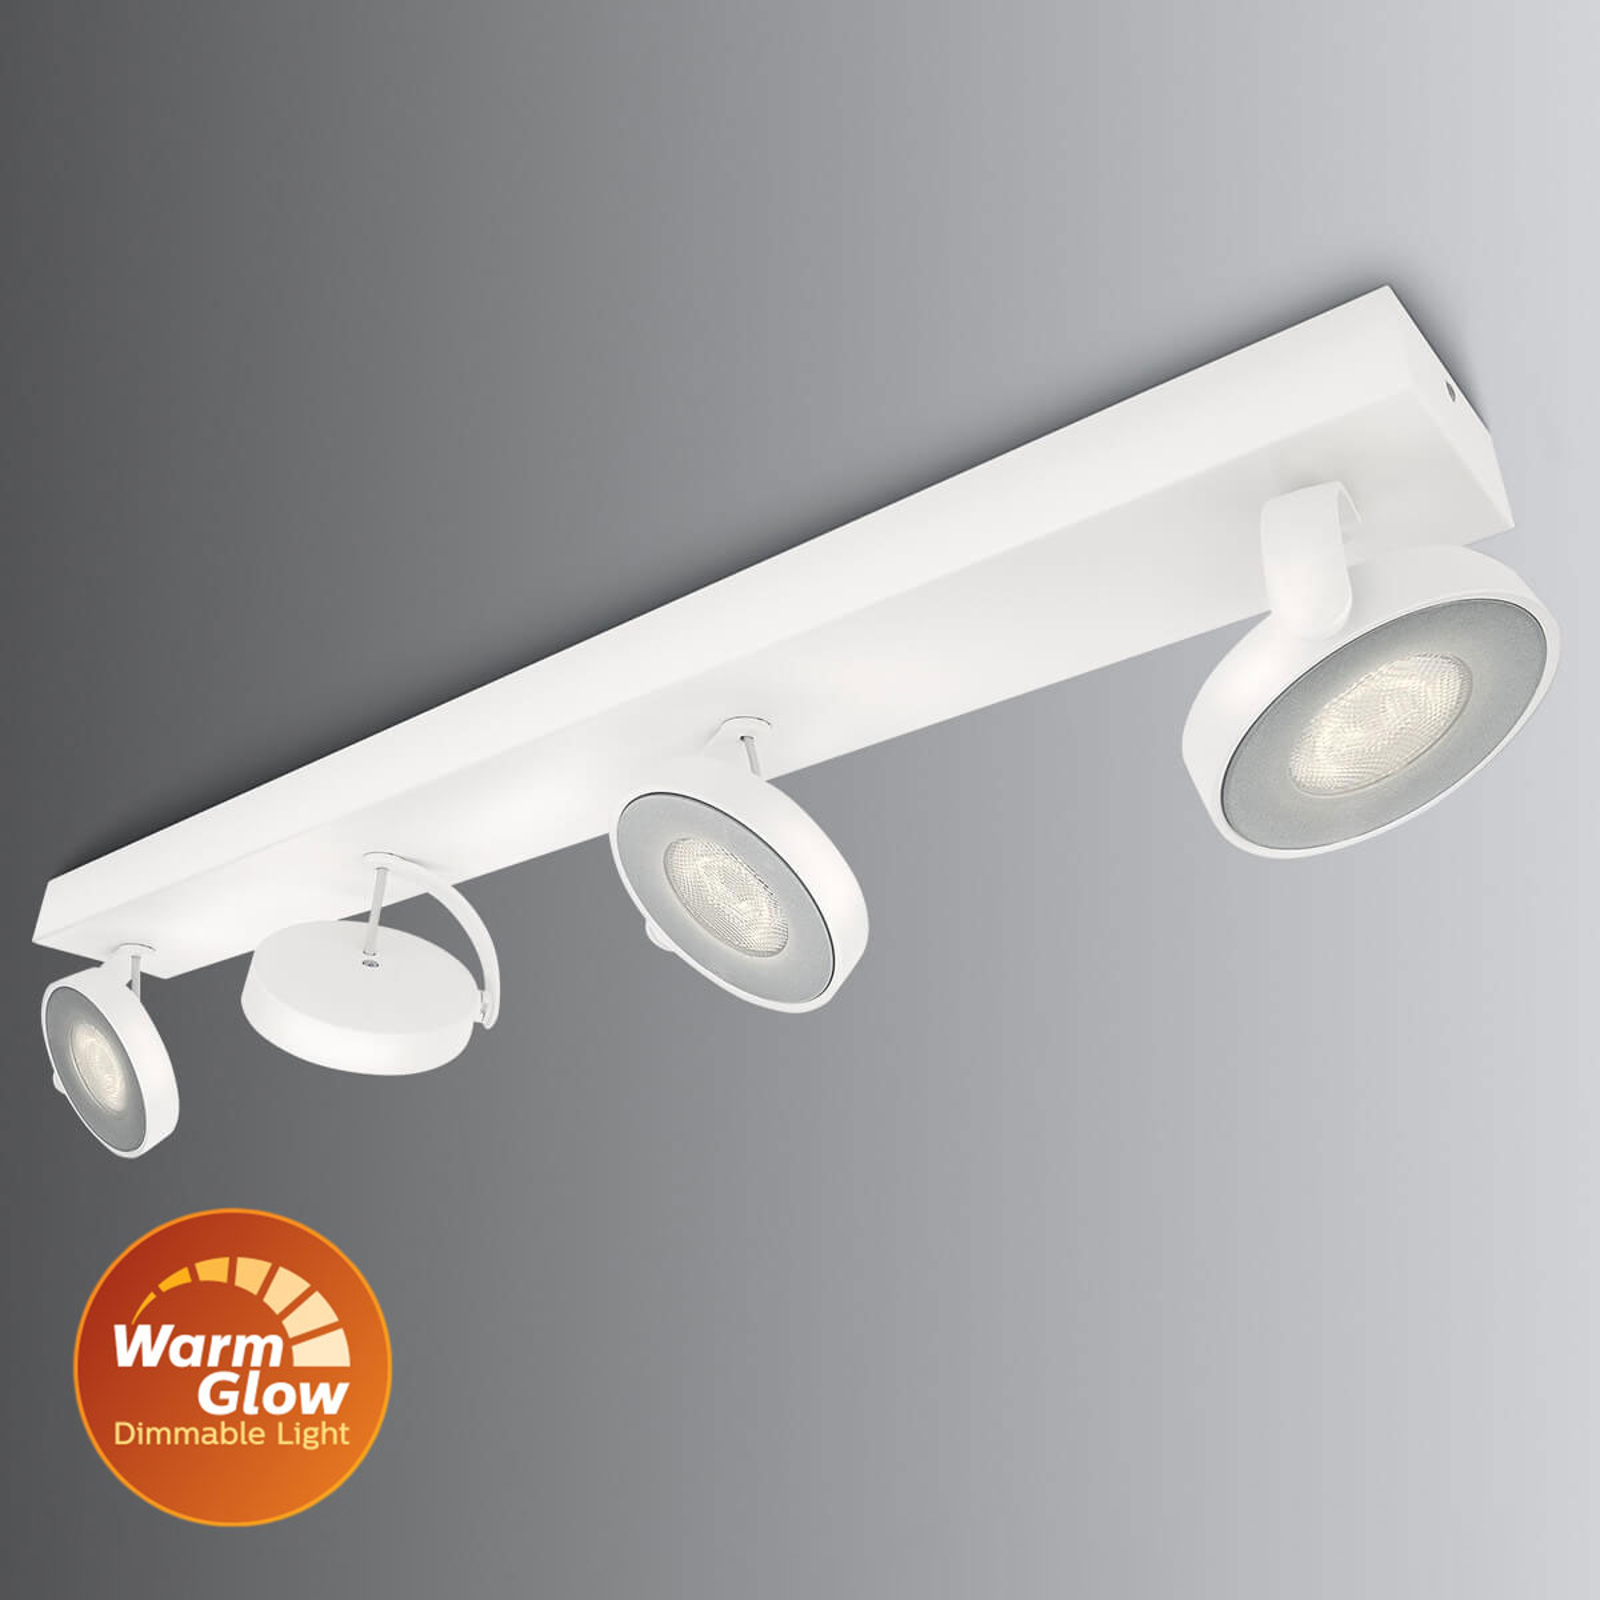 Philips Clockwork LED-Strahler weiß 4flg. WarmGlow